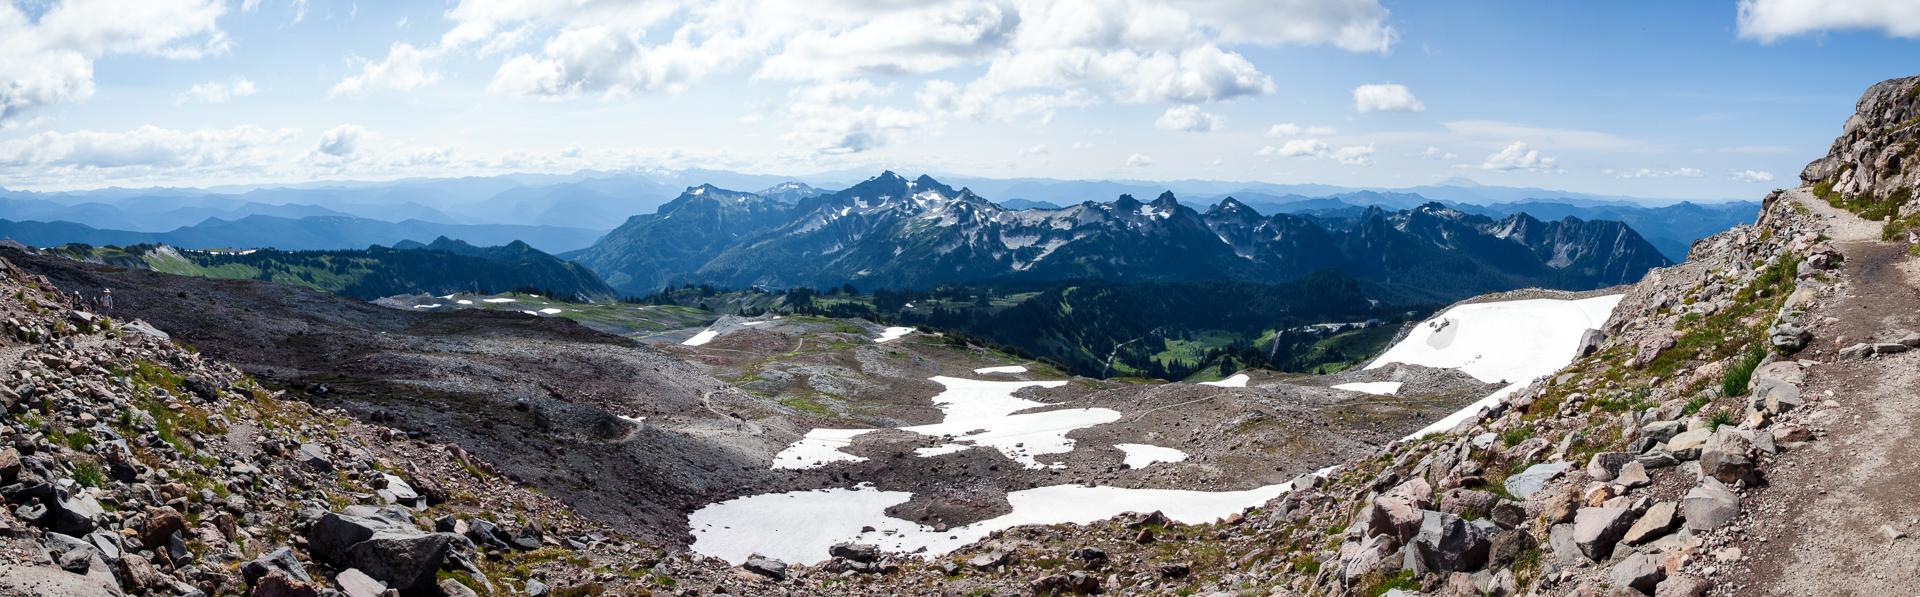 Mount Rainier_Sat-63.jpg